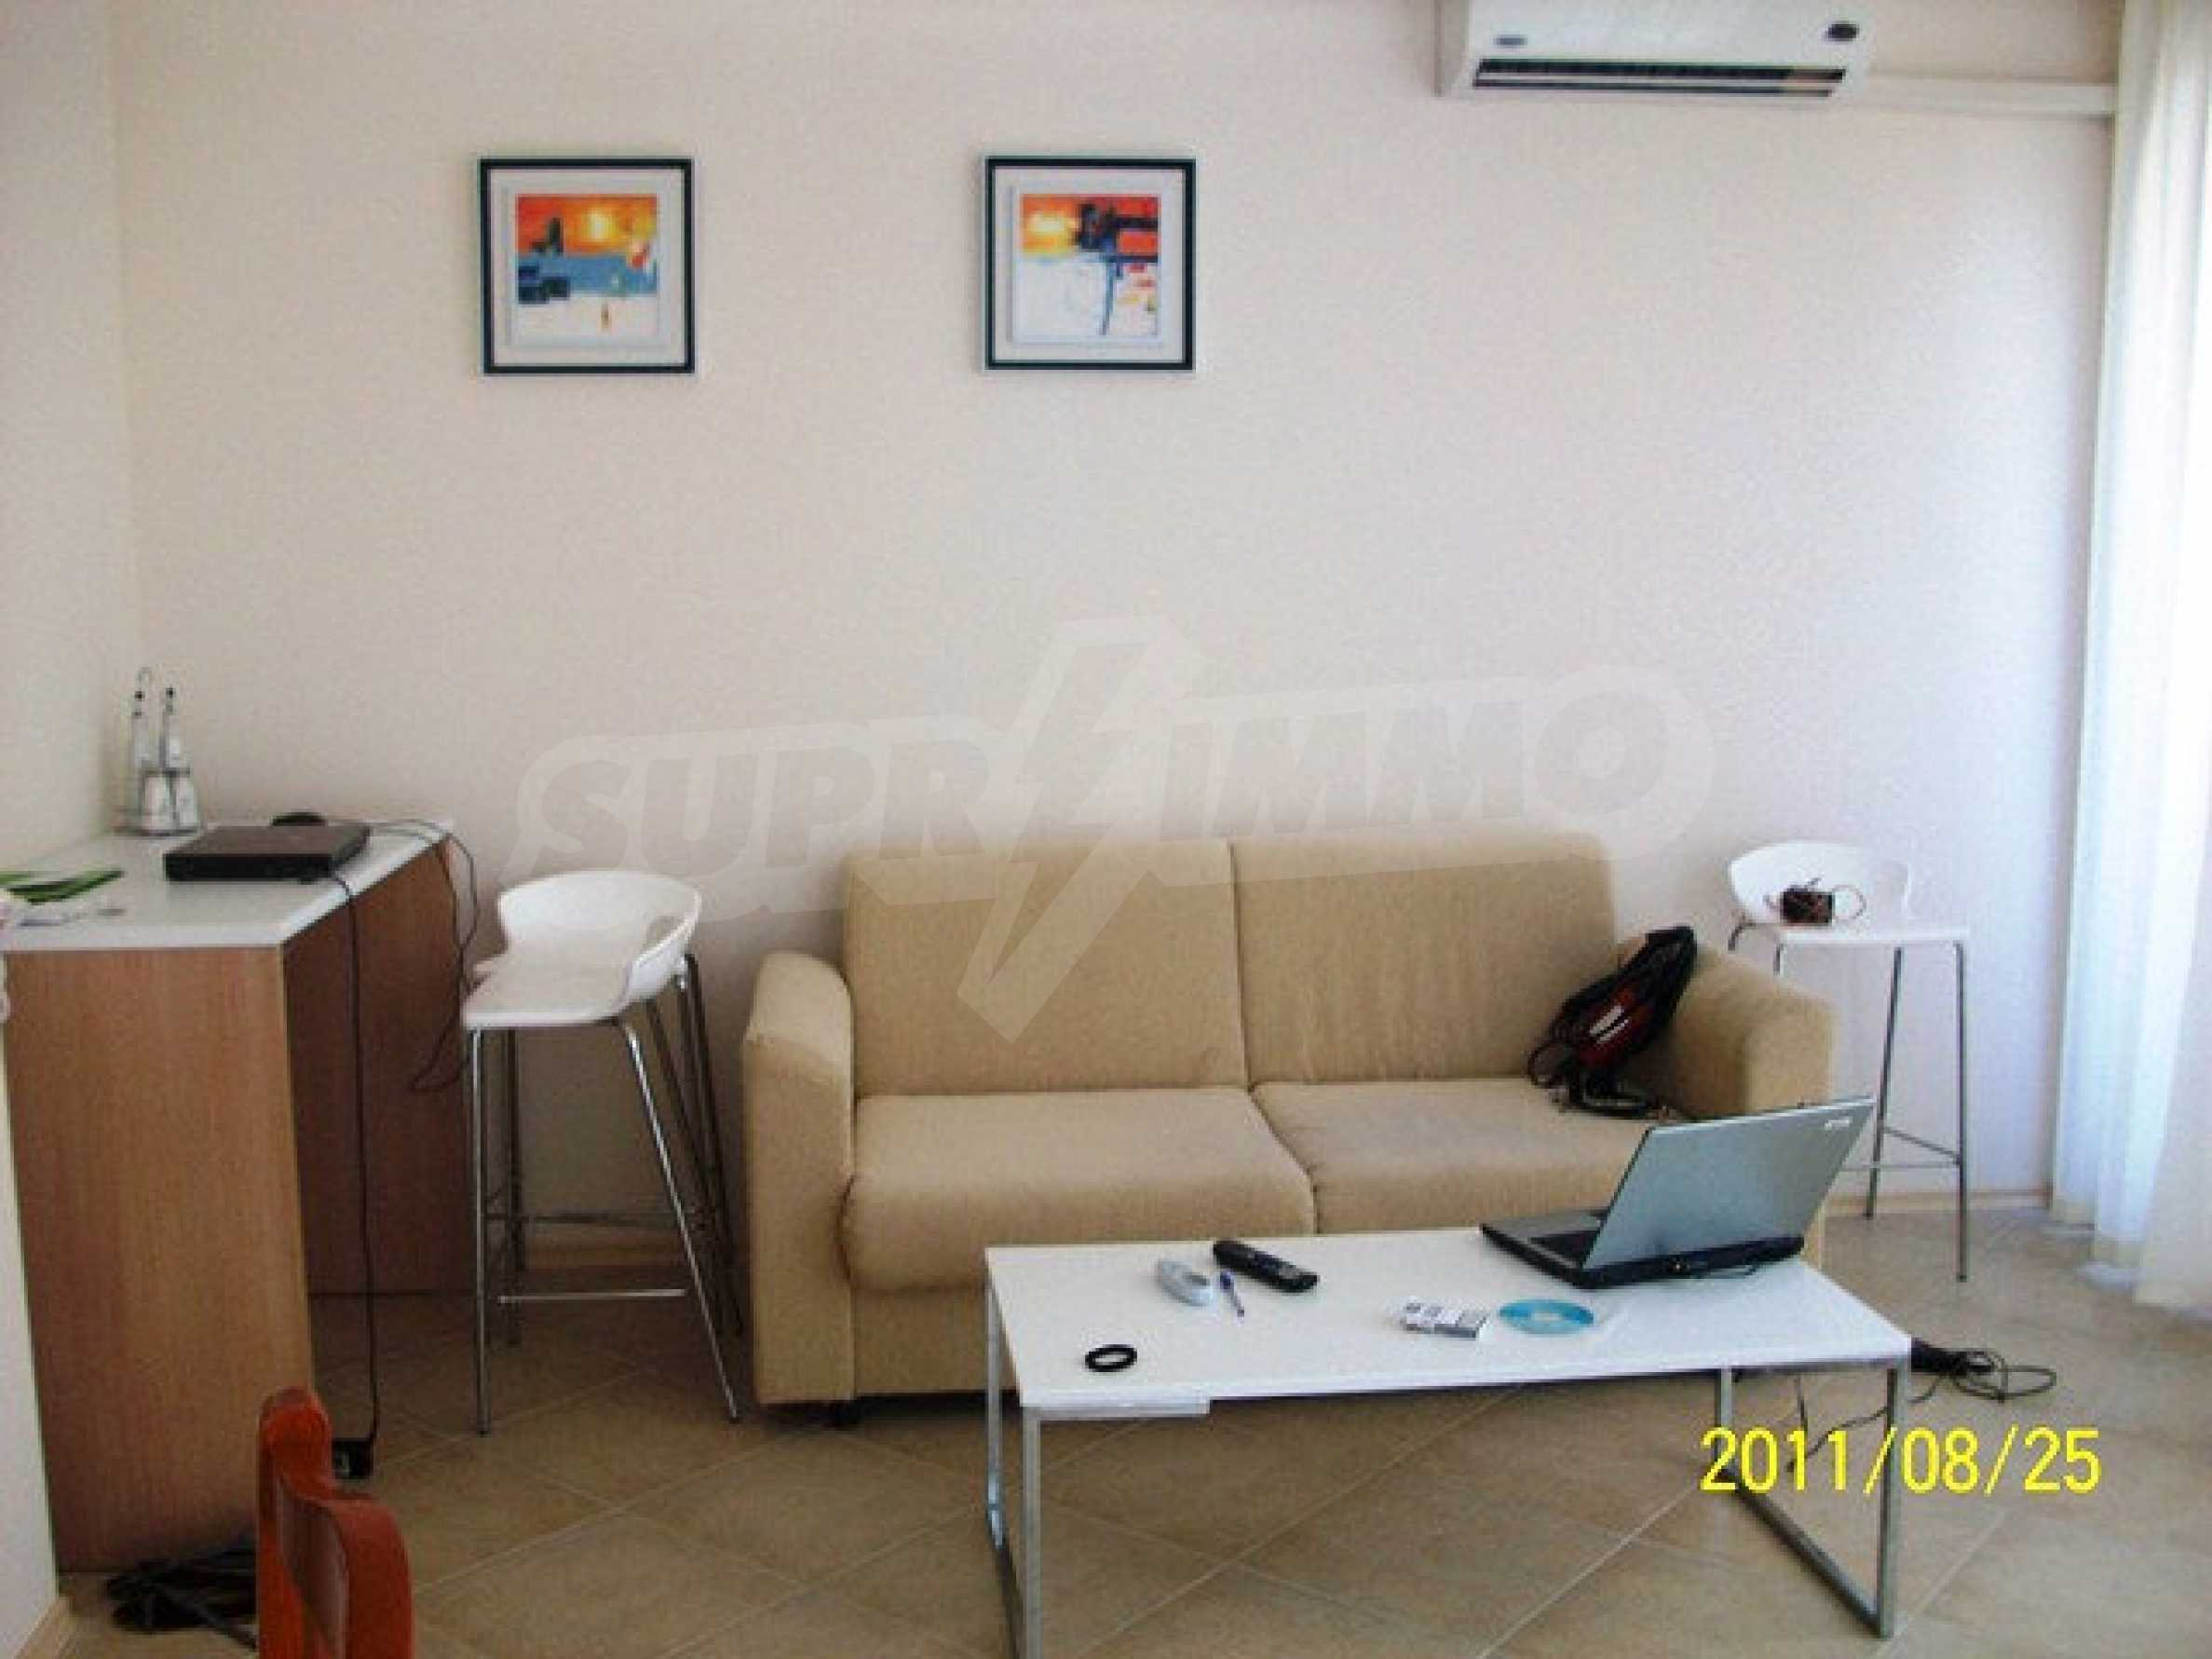 Трехкомнатный апартамент на продажу в комплексе Emberli в курорте Лозенец 15